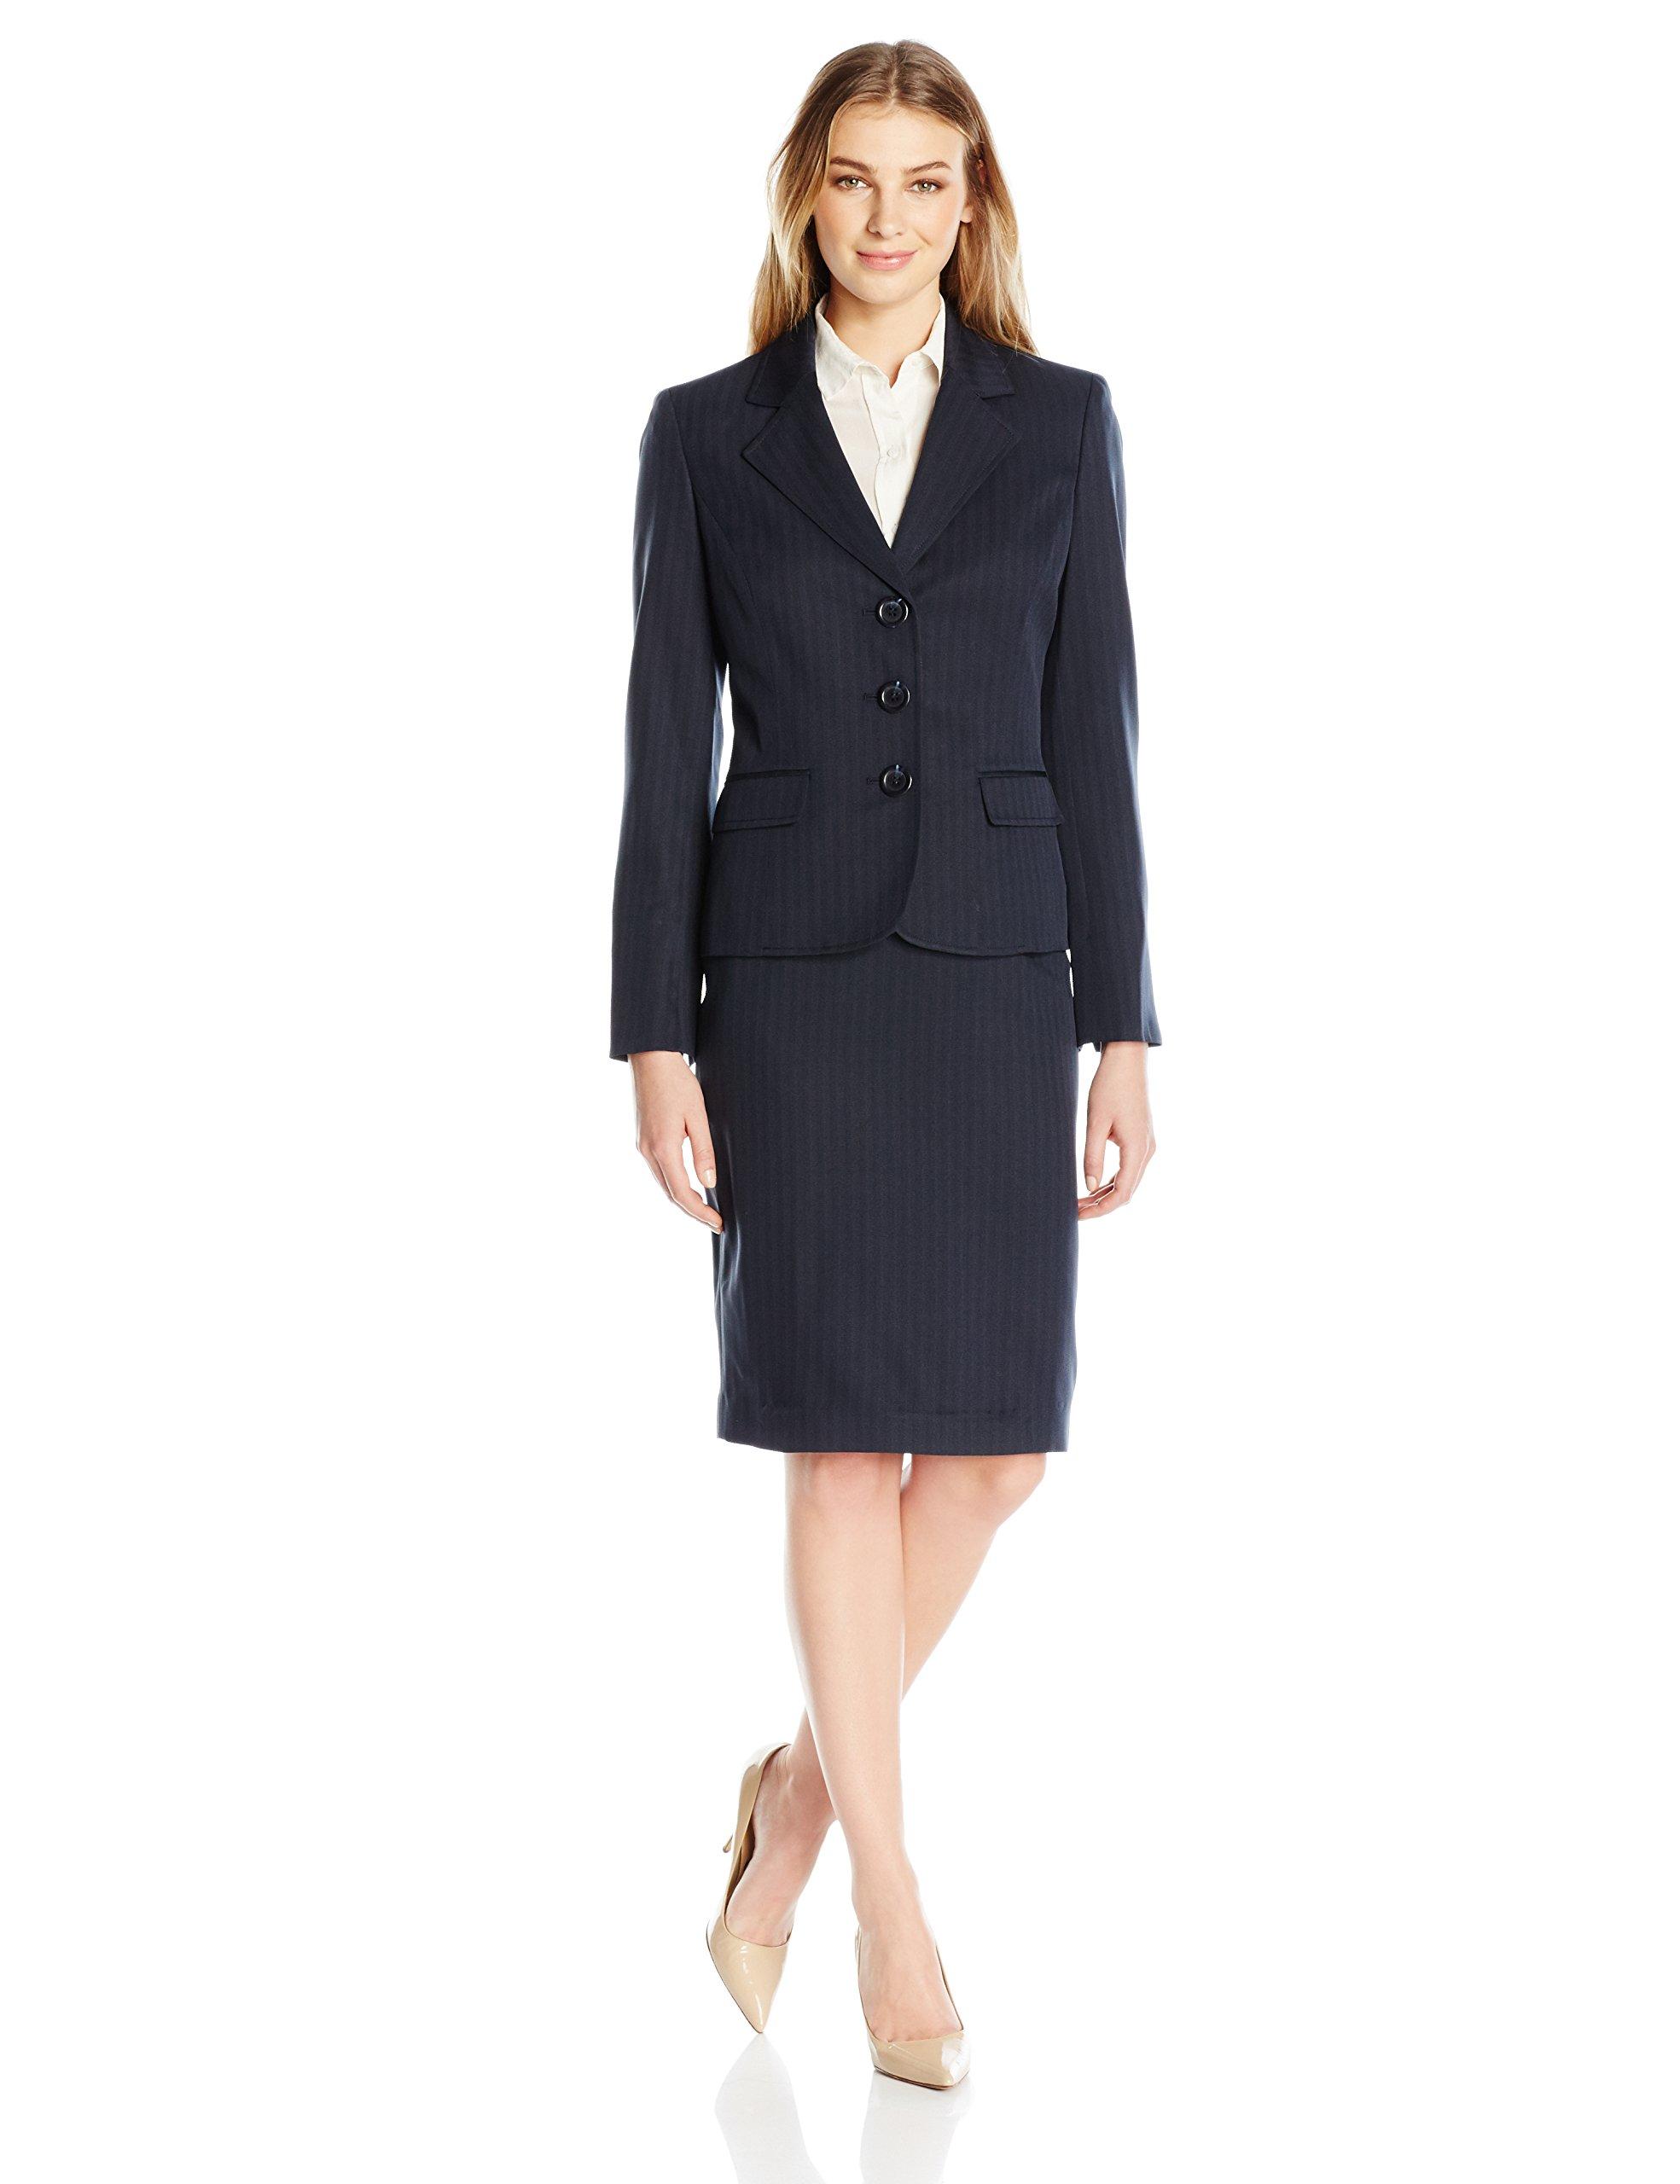 Le Suit Women's Three Button Skirt, Navy, 8